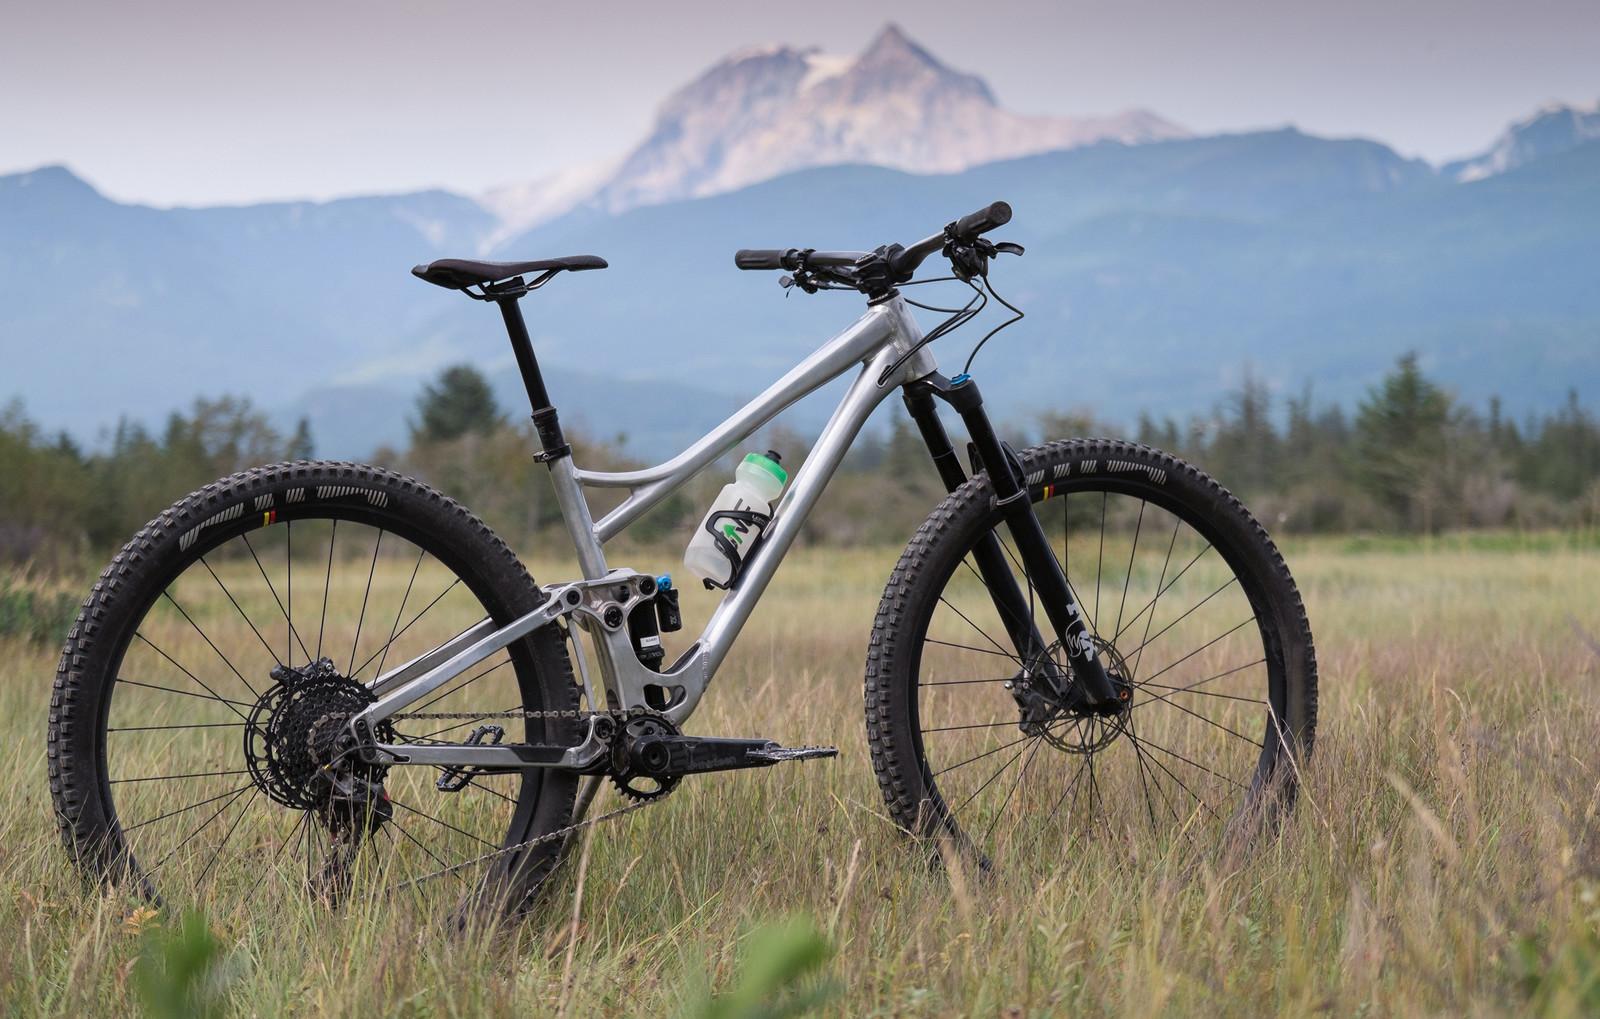 Brandnew Mountain Bike